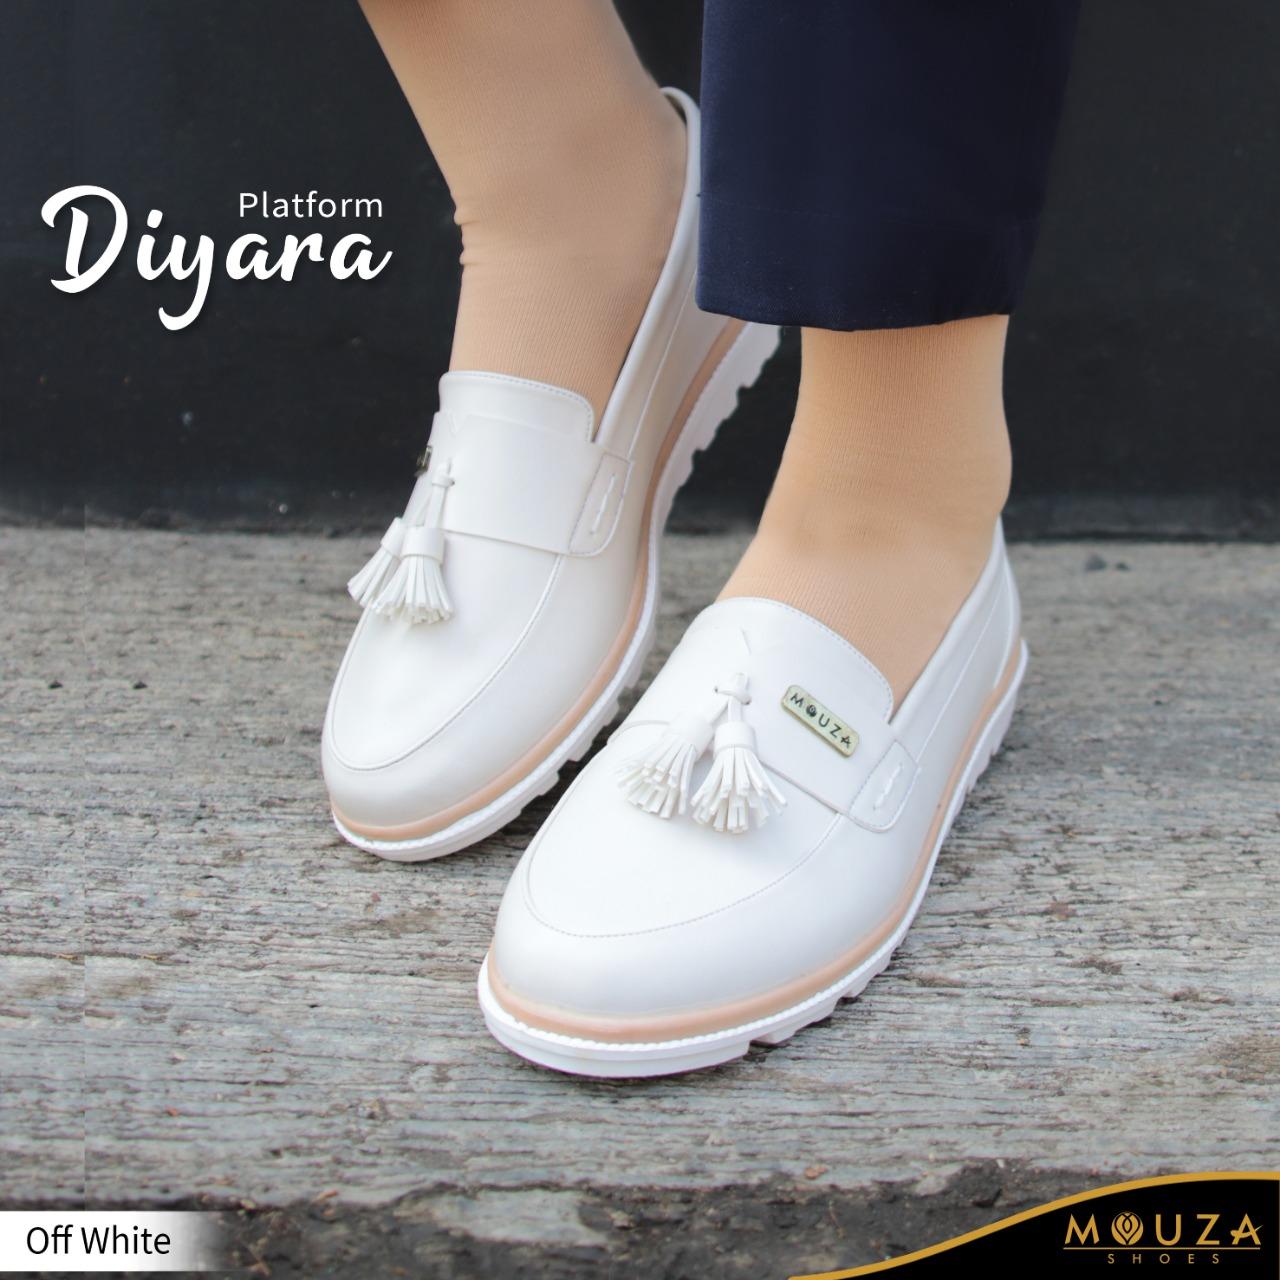 Platform Diyara